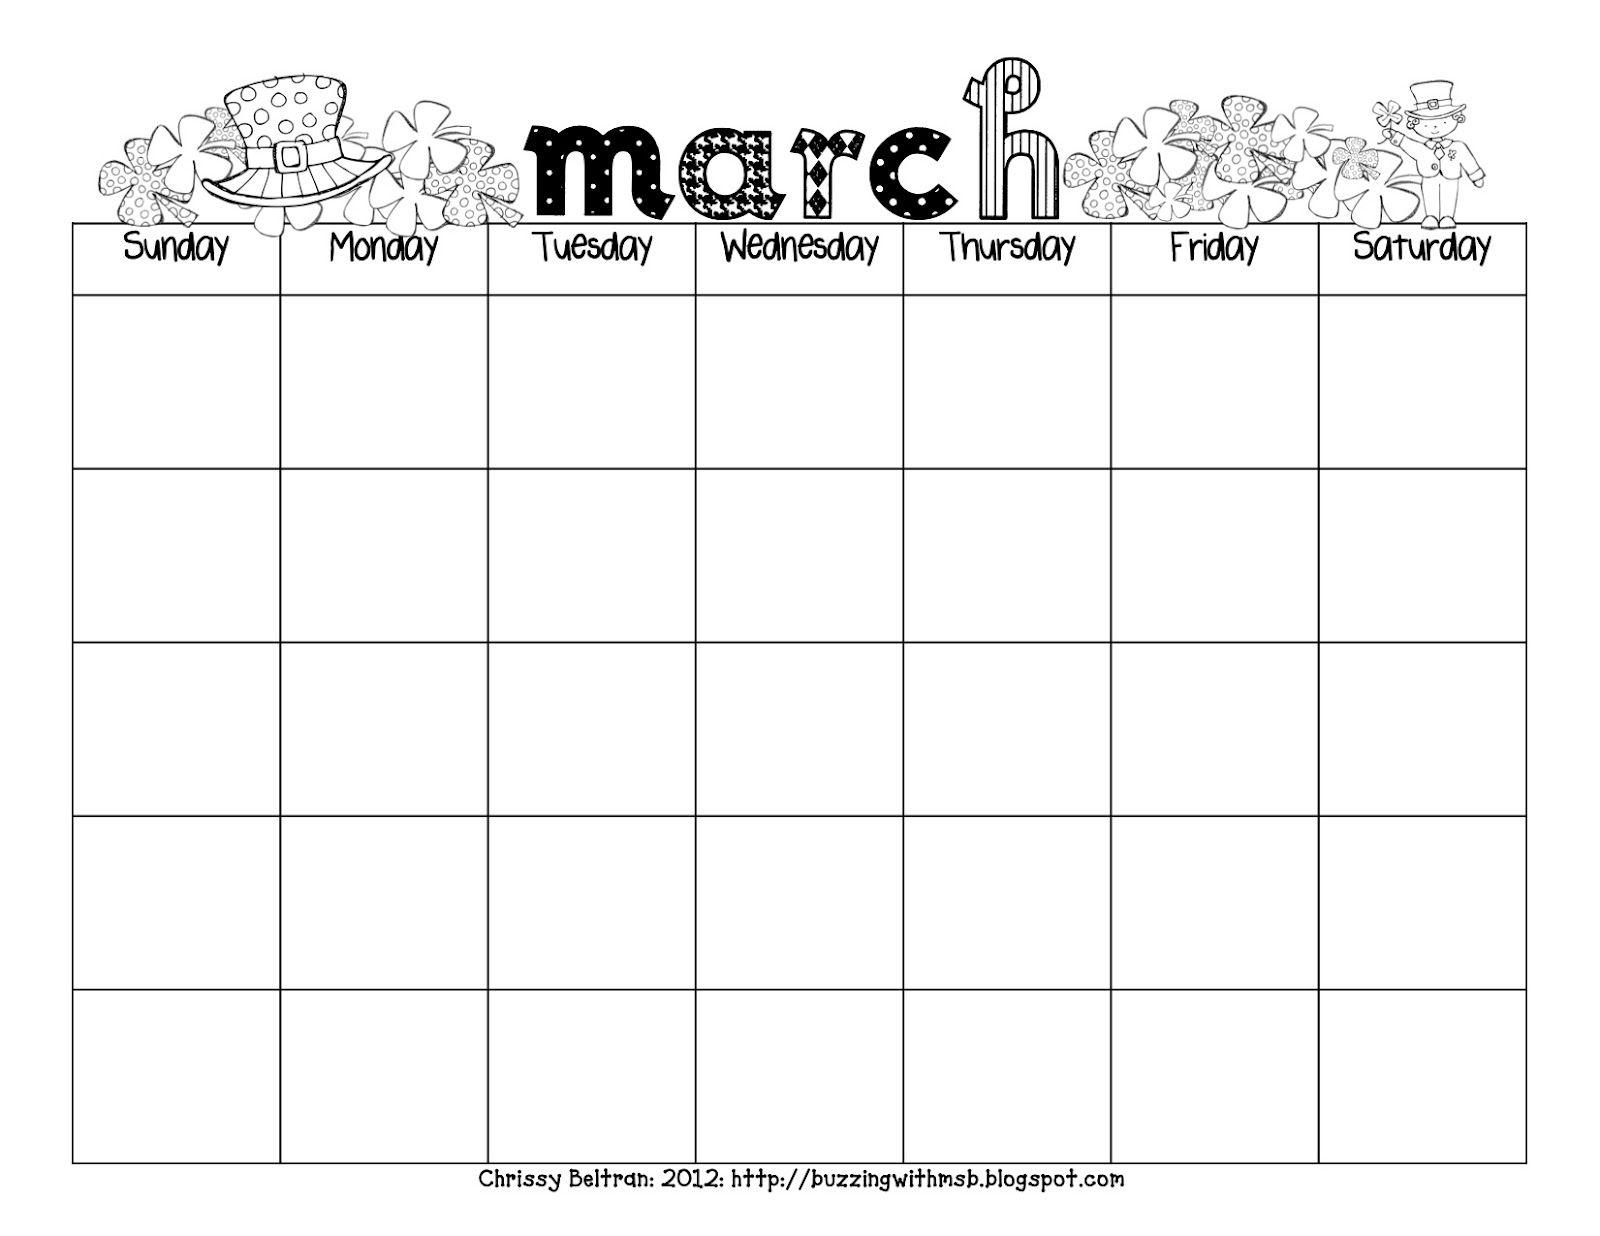 Carson Dellosa Printable Calendars | Want A March Calendar